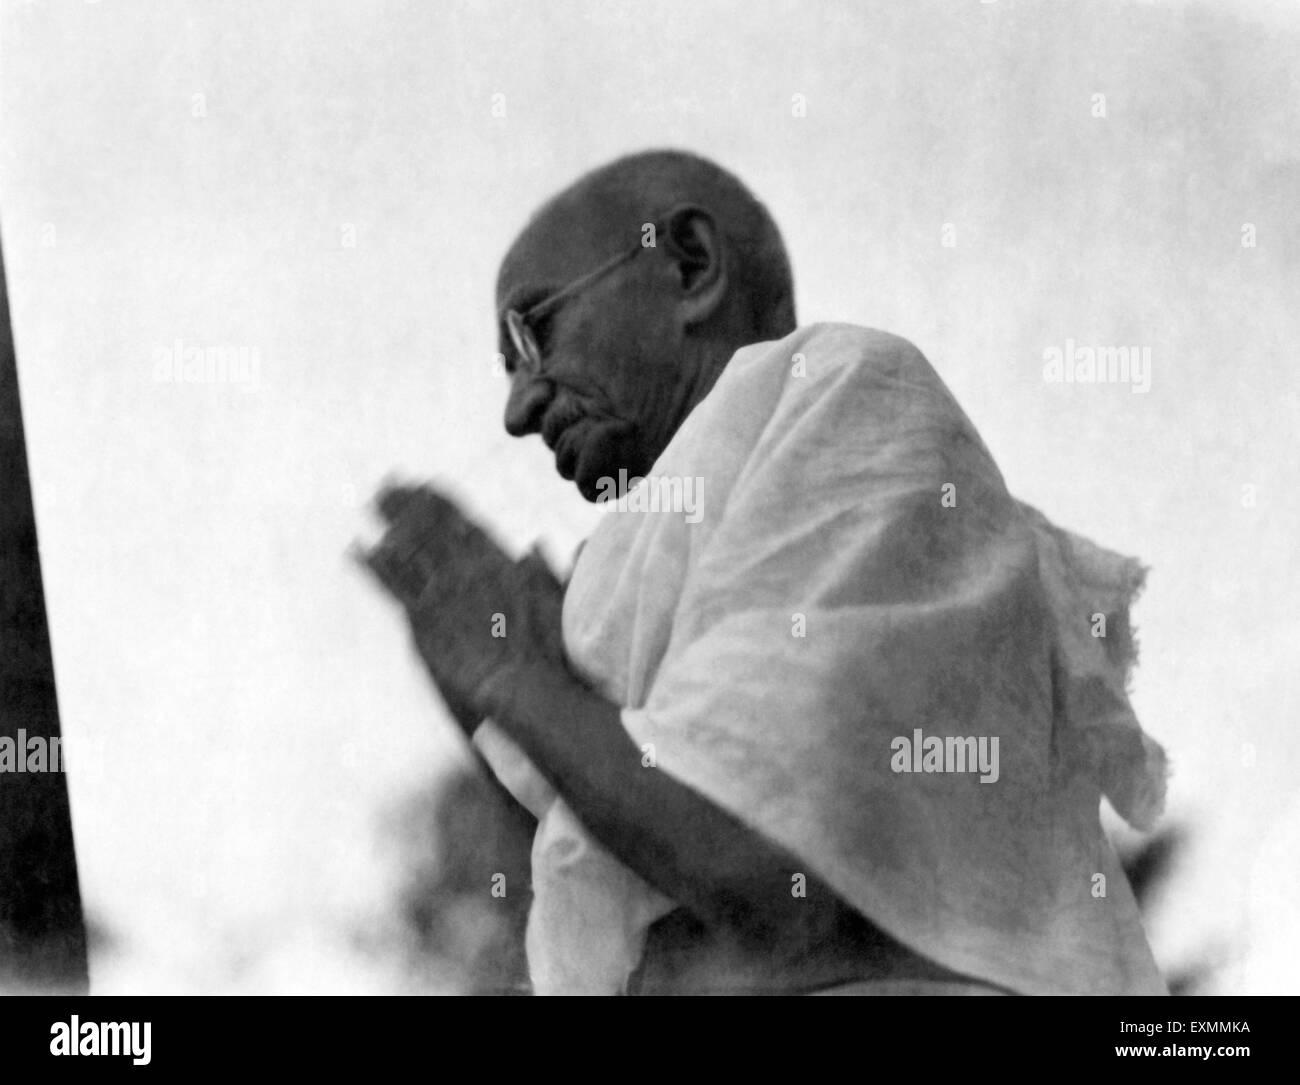 Mahatma Gandhi in greeting pose ; Mumbai ; 1942 ; India NO MR - Stock Image